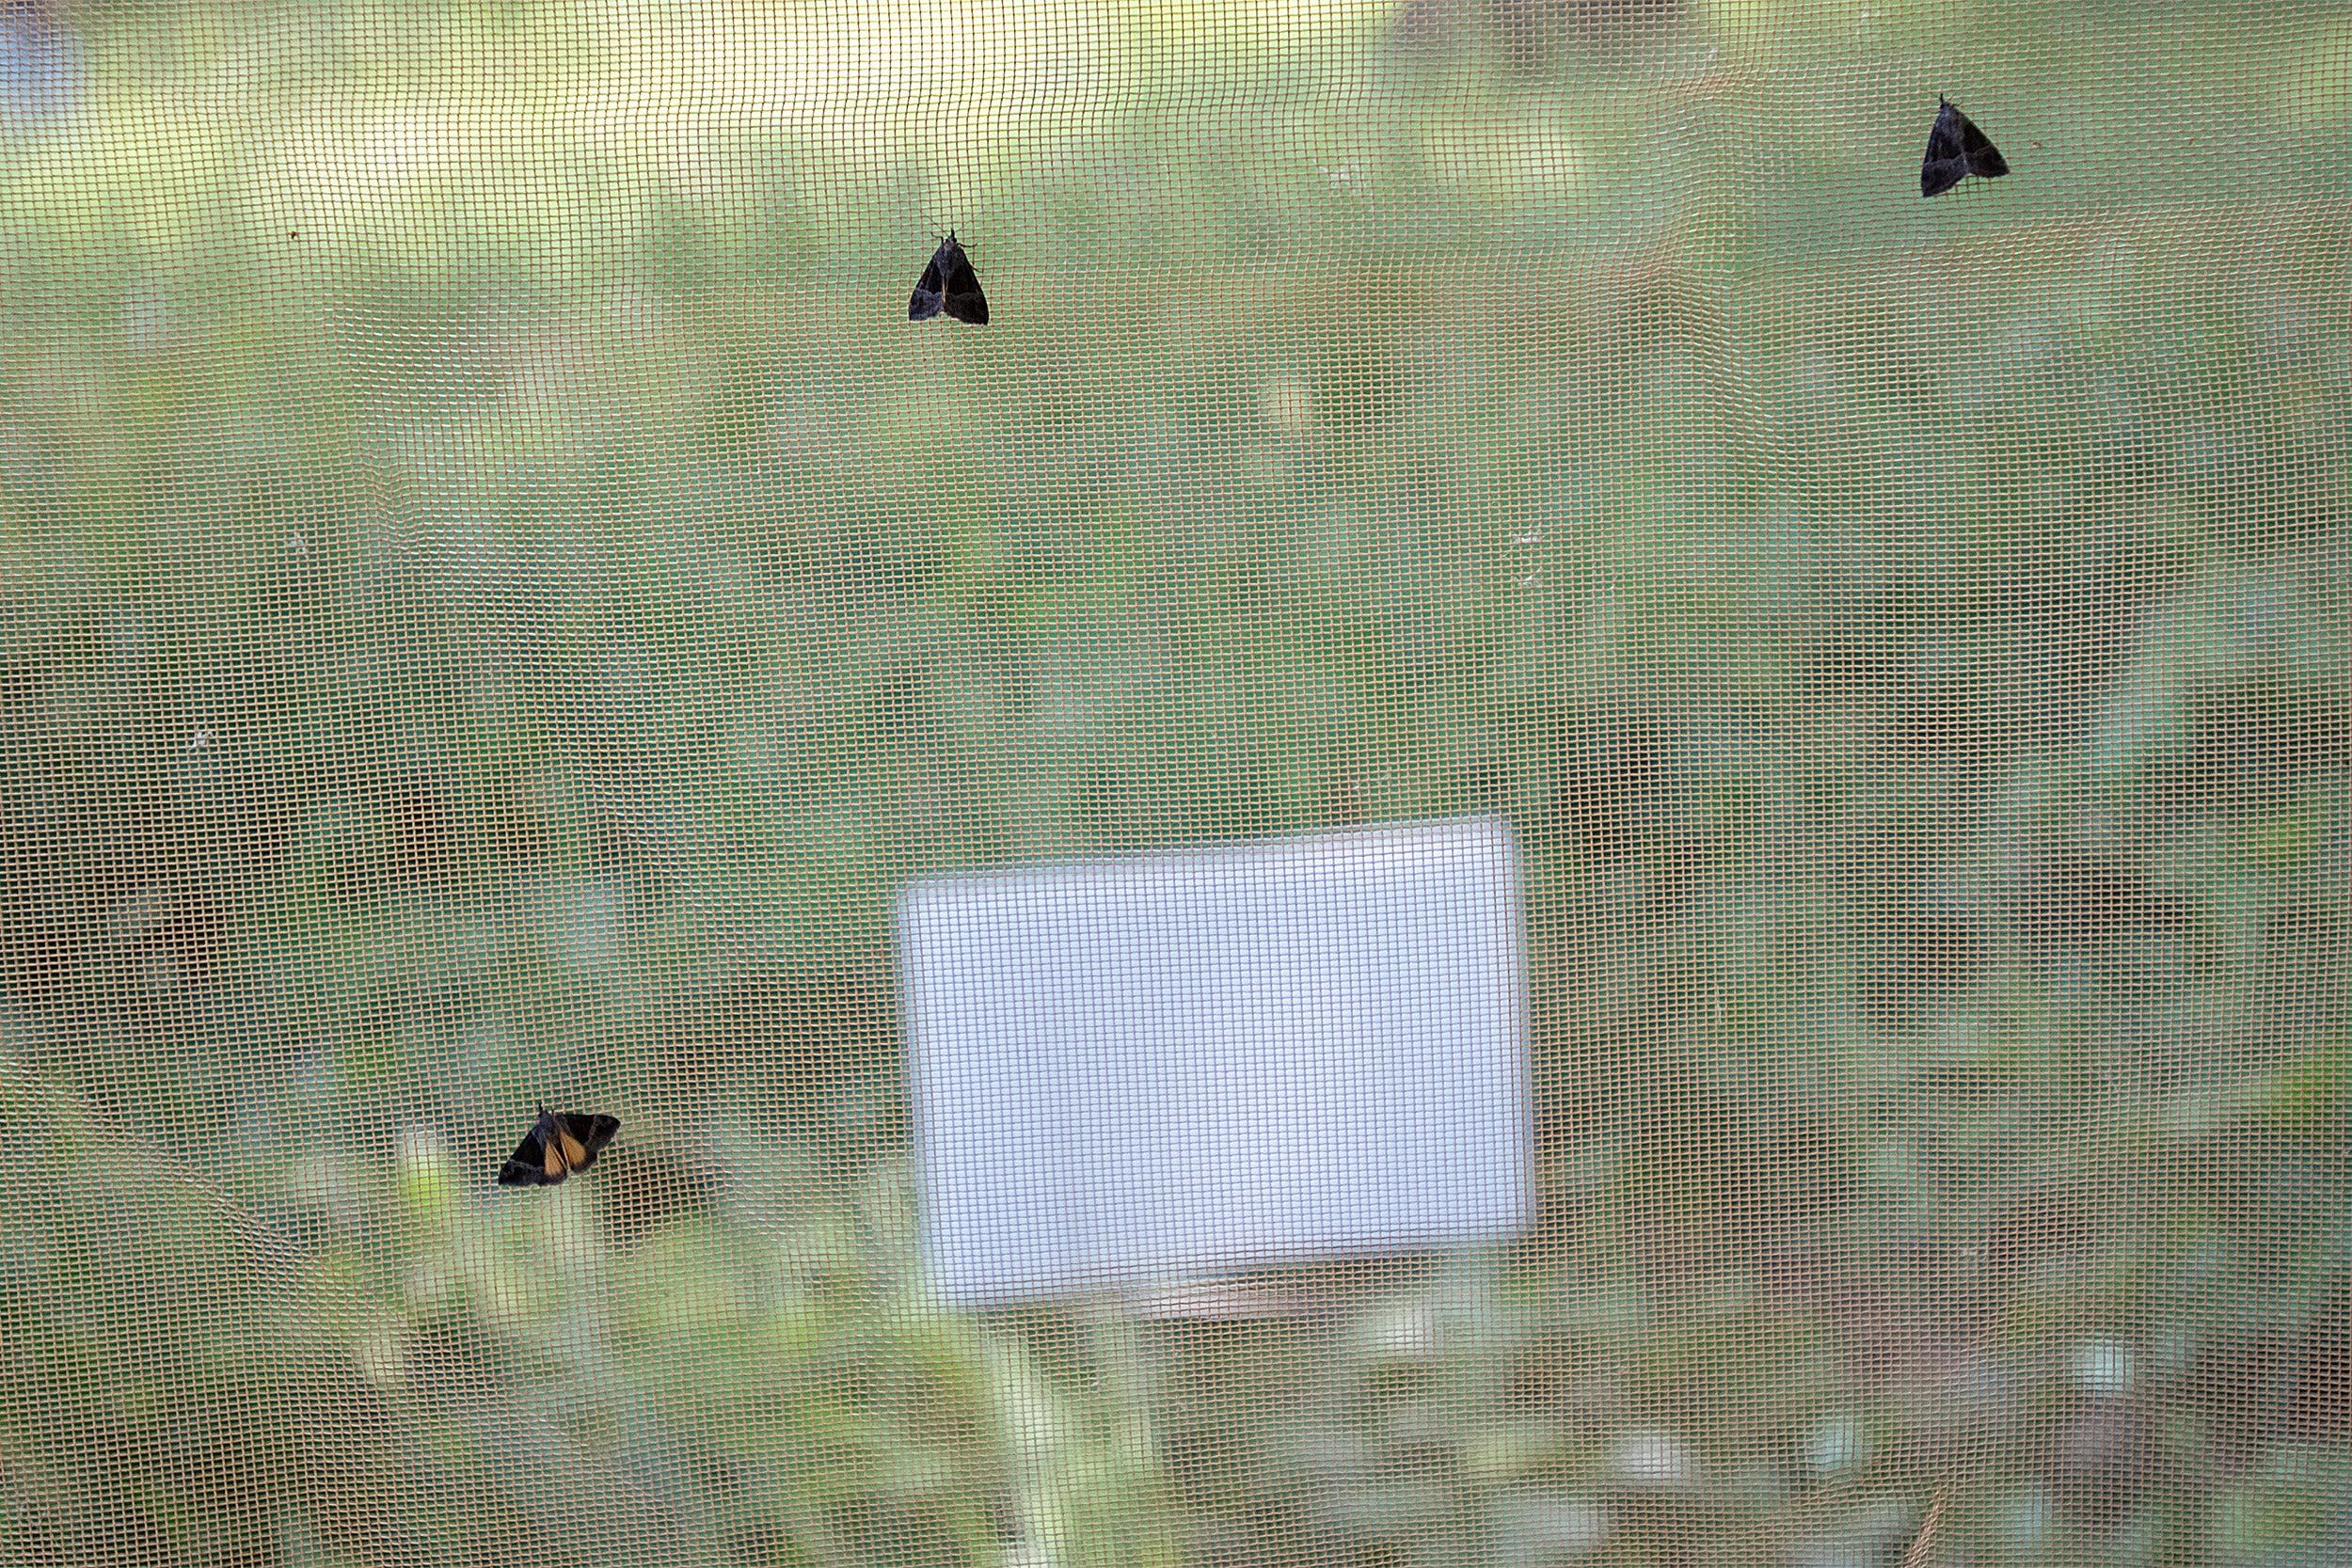 Moths on screen